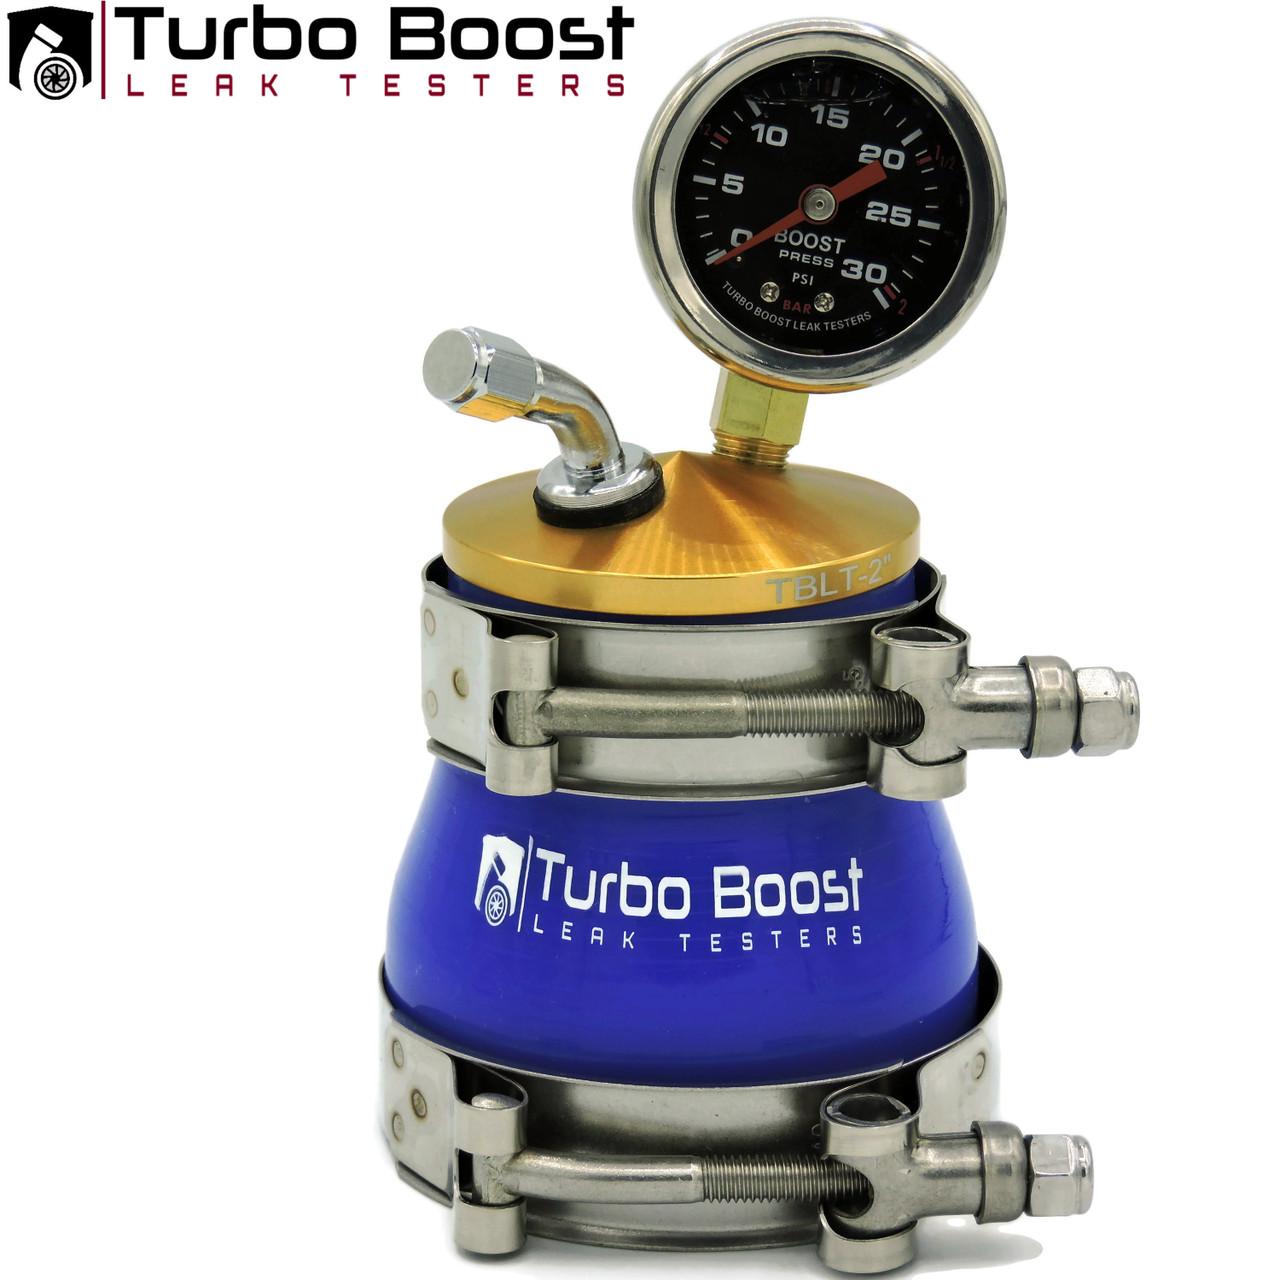 "Shop Kit -2"" inch to 4"" inch - BILLET 6061 Aluminum - Universal Boost Leak Tester Kit"